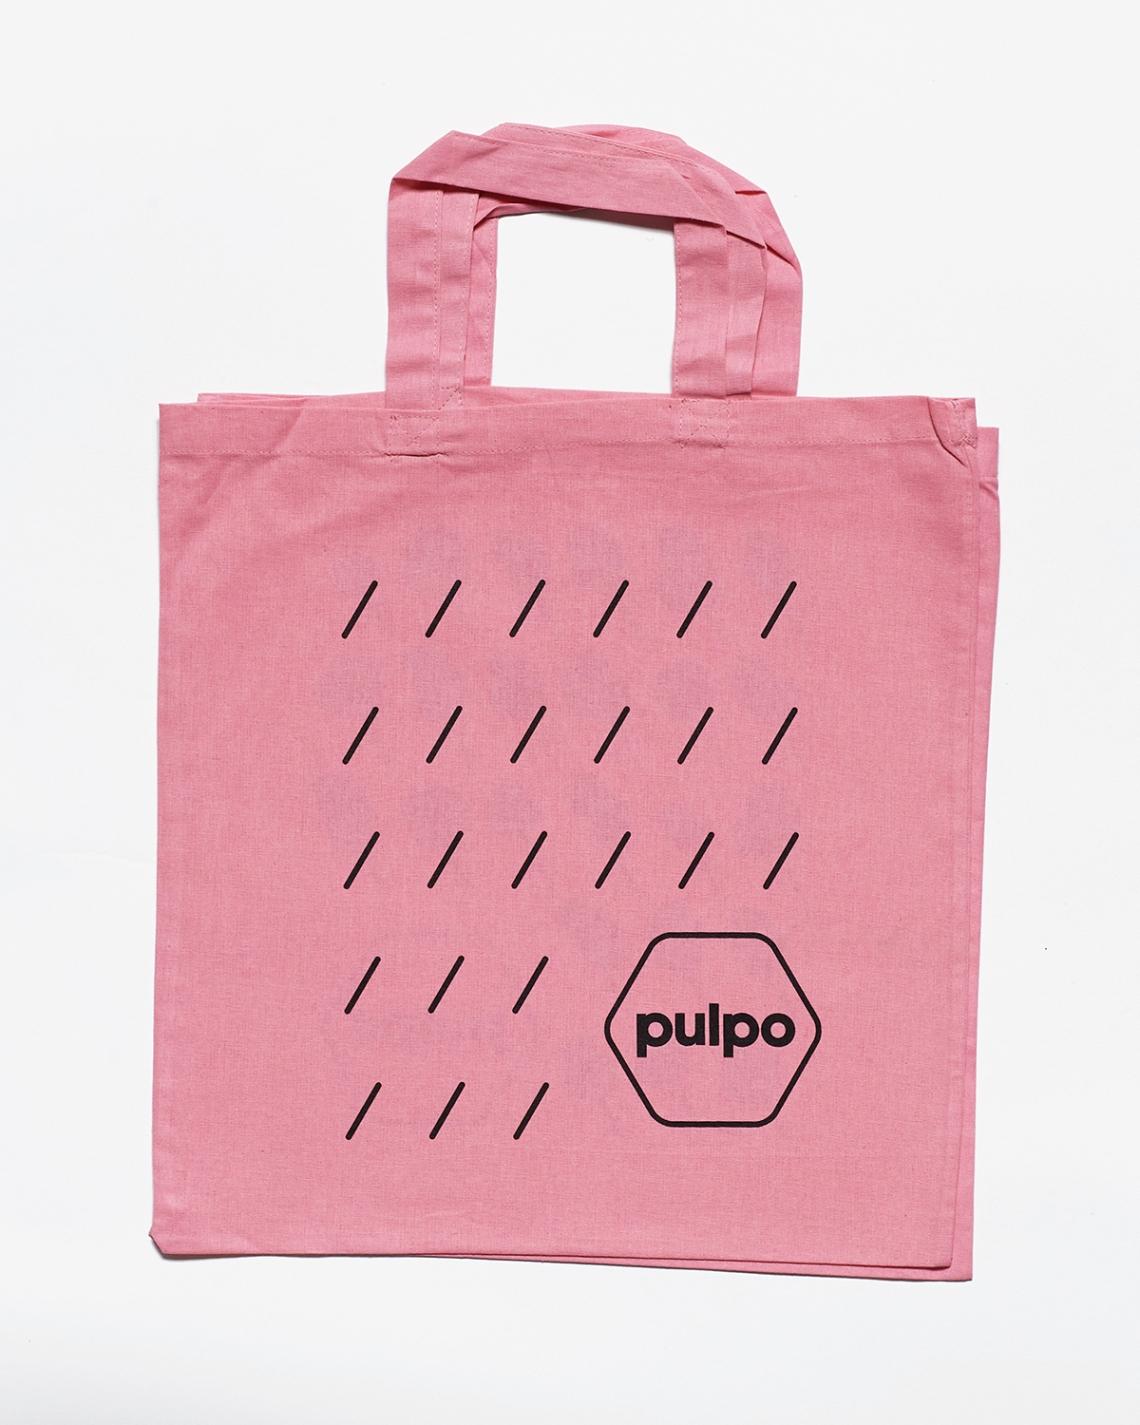 sign_pulpo006